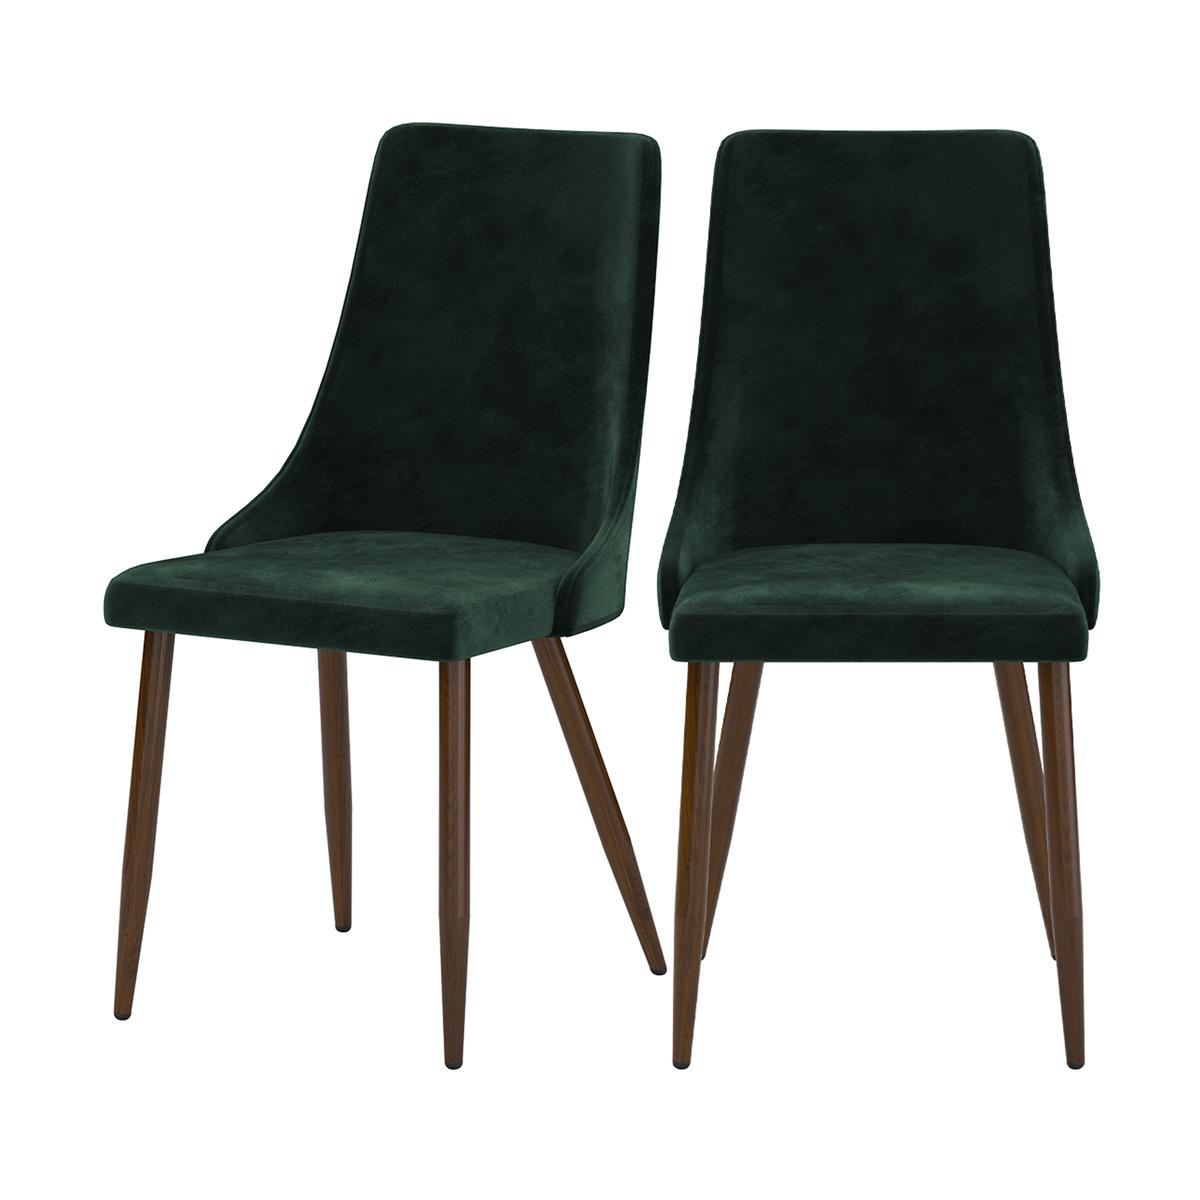 Chaise en velours vert (lot de 2)